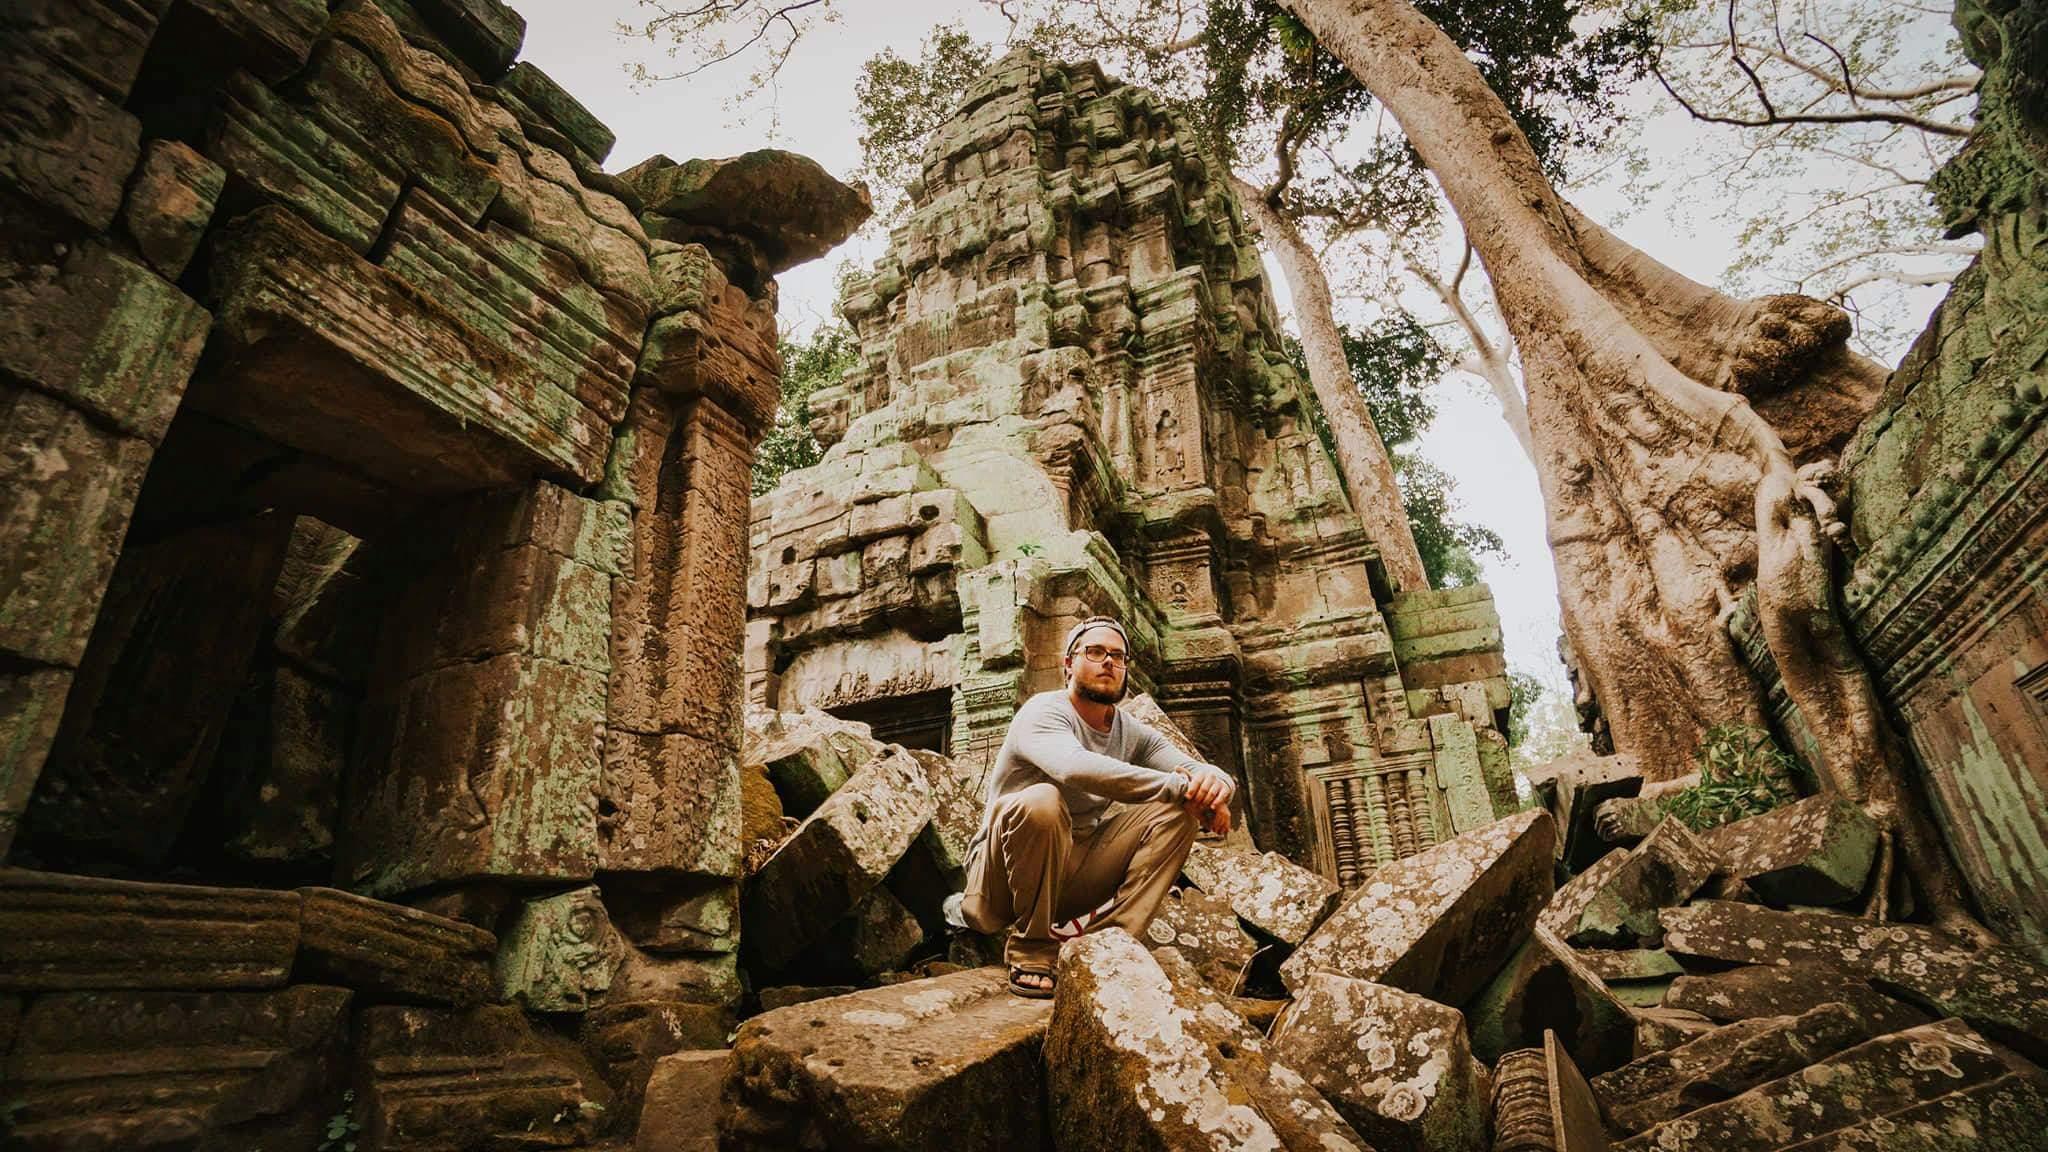 polywander-one-week-in-cambodia